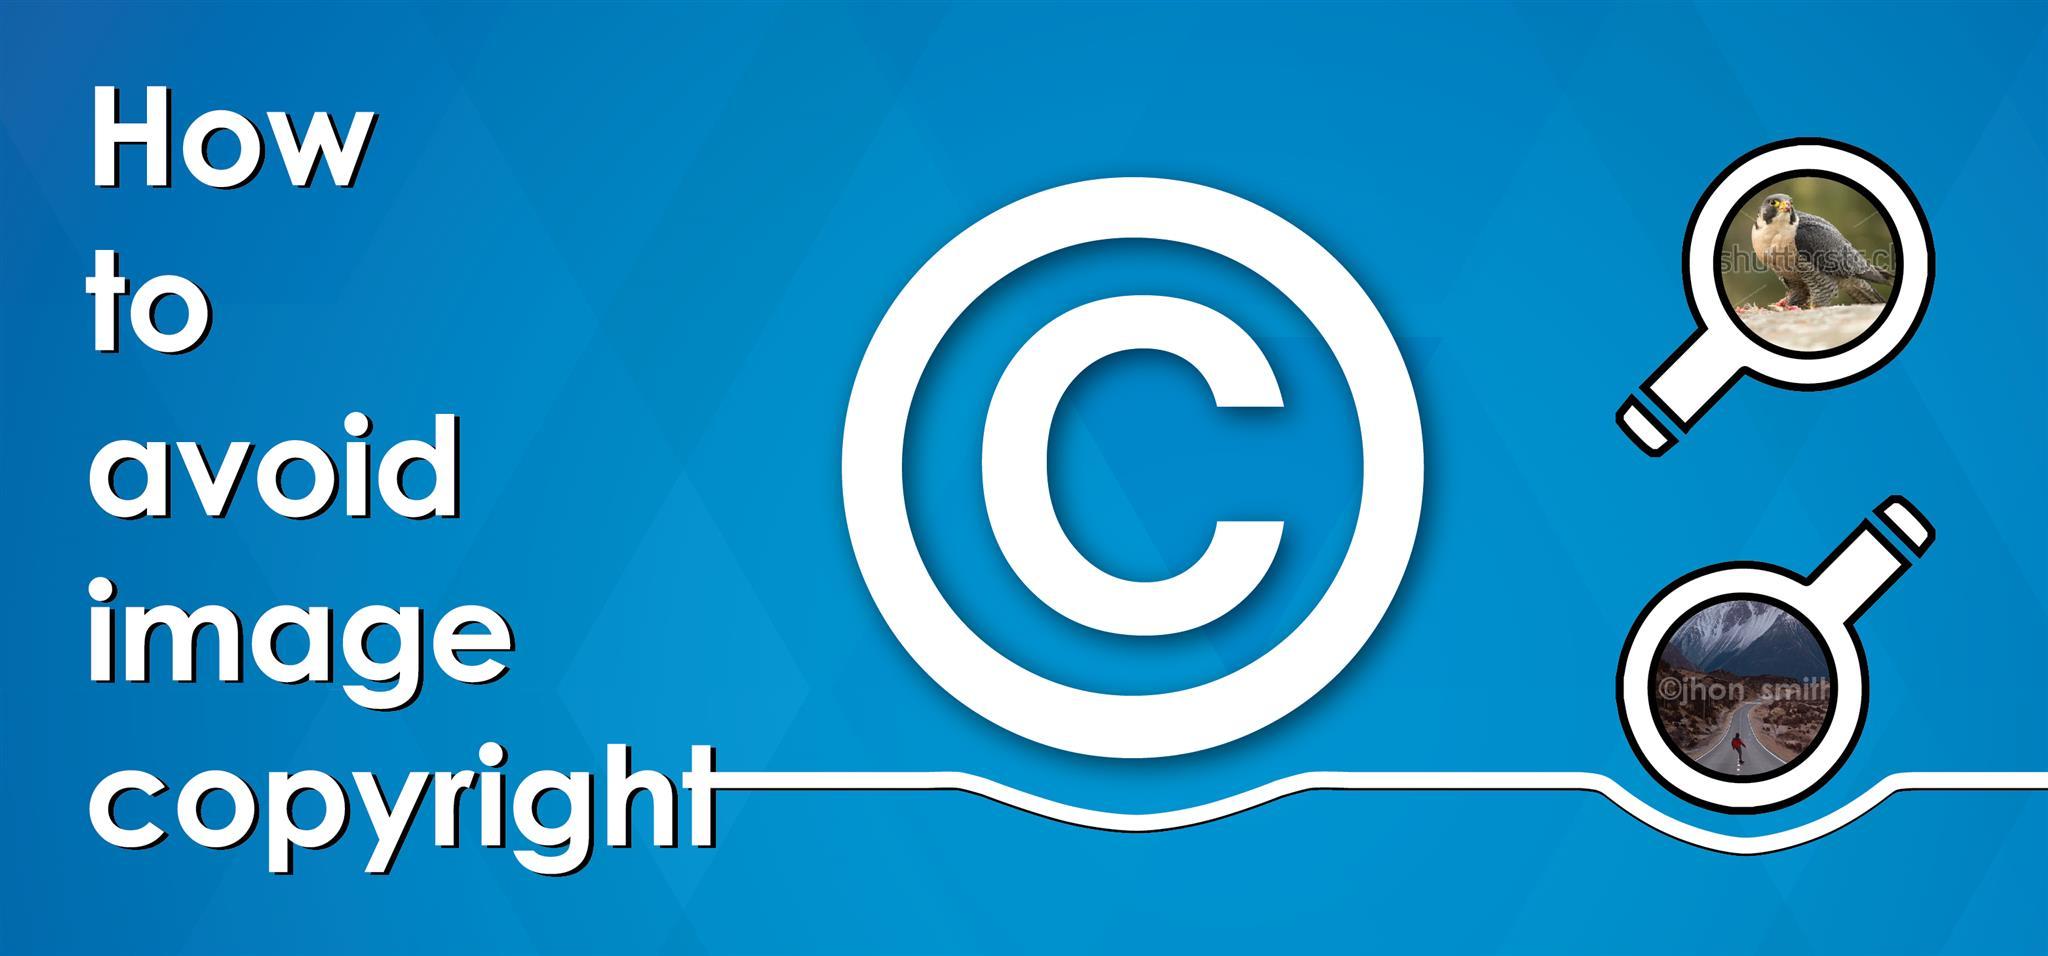 ways to avoid image copyright